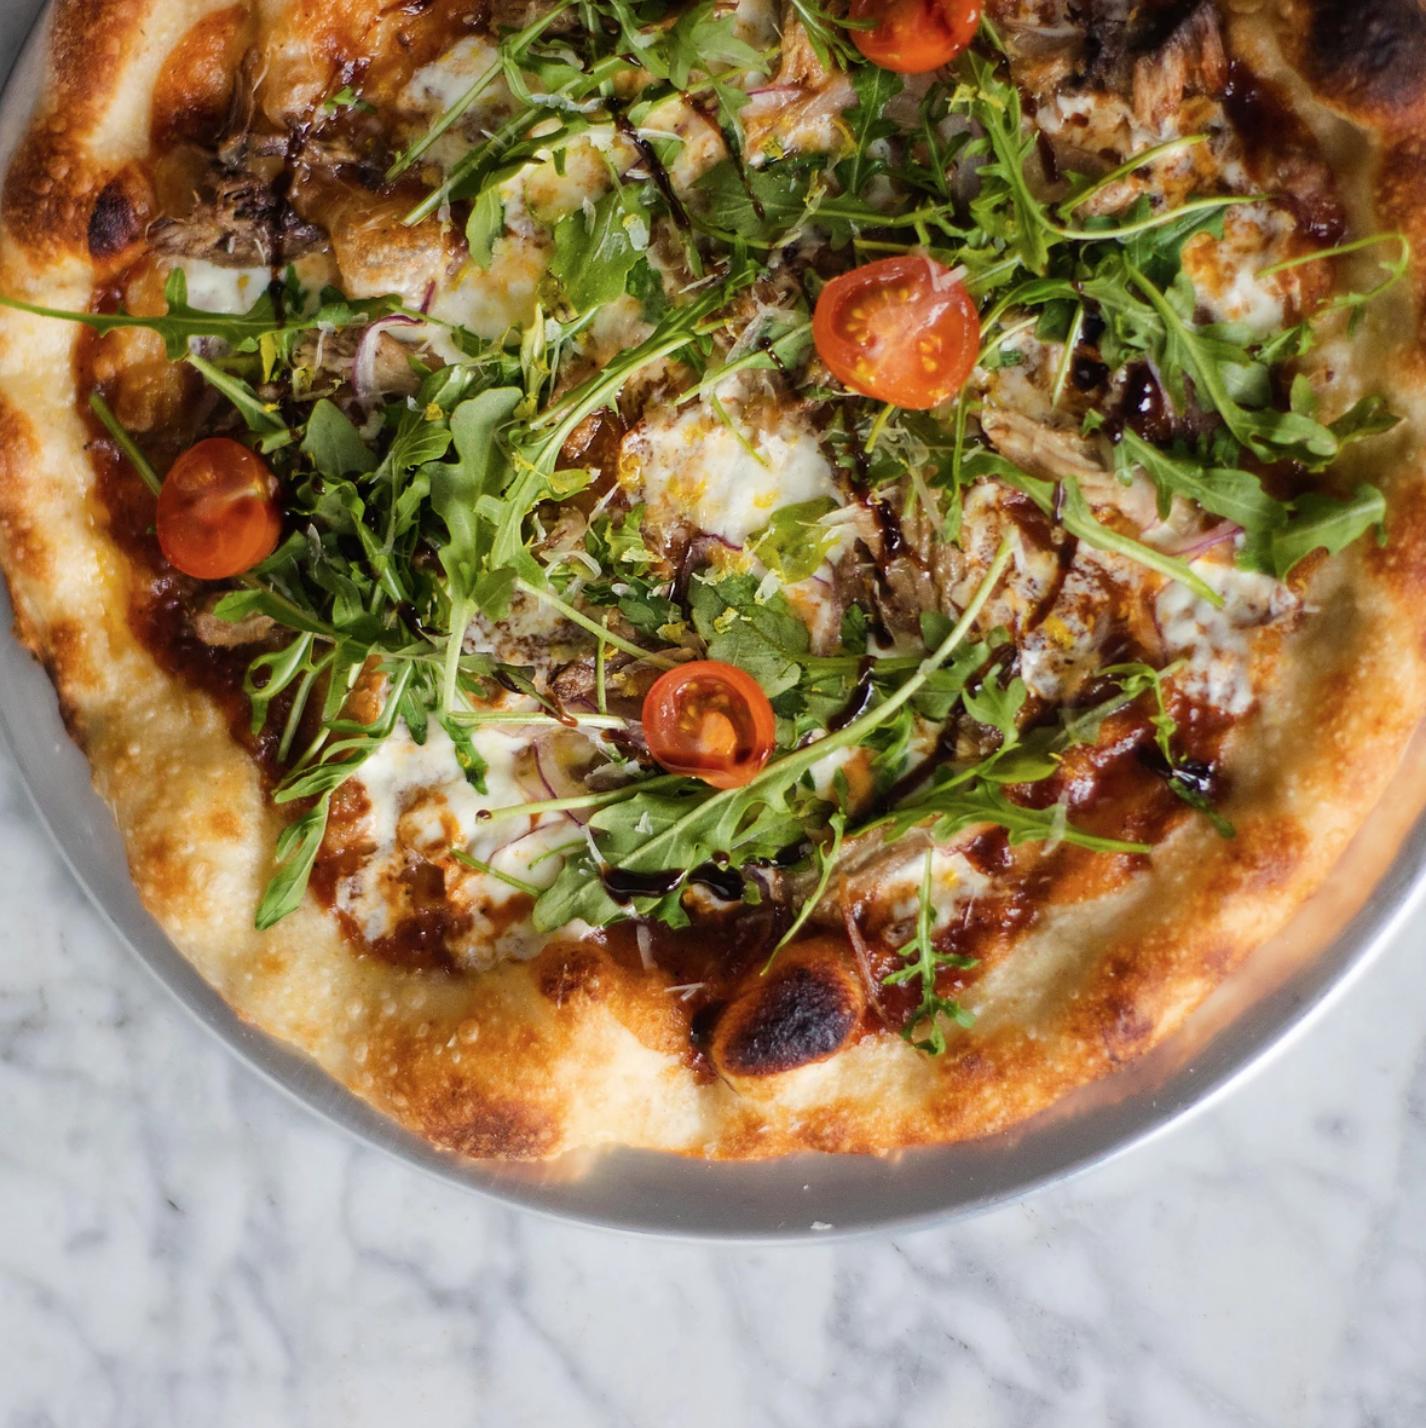 Lamar Union Restaurant Serving Gold Pizza Instagram Bait Opens This Week